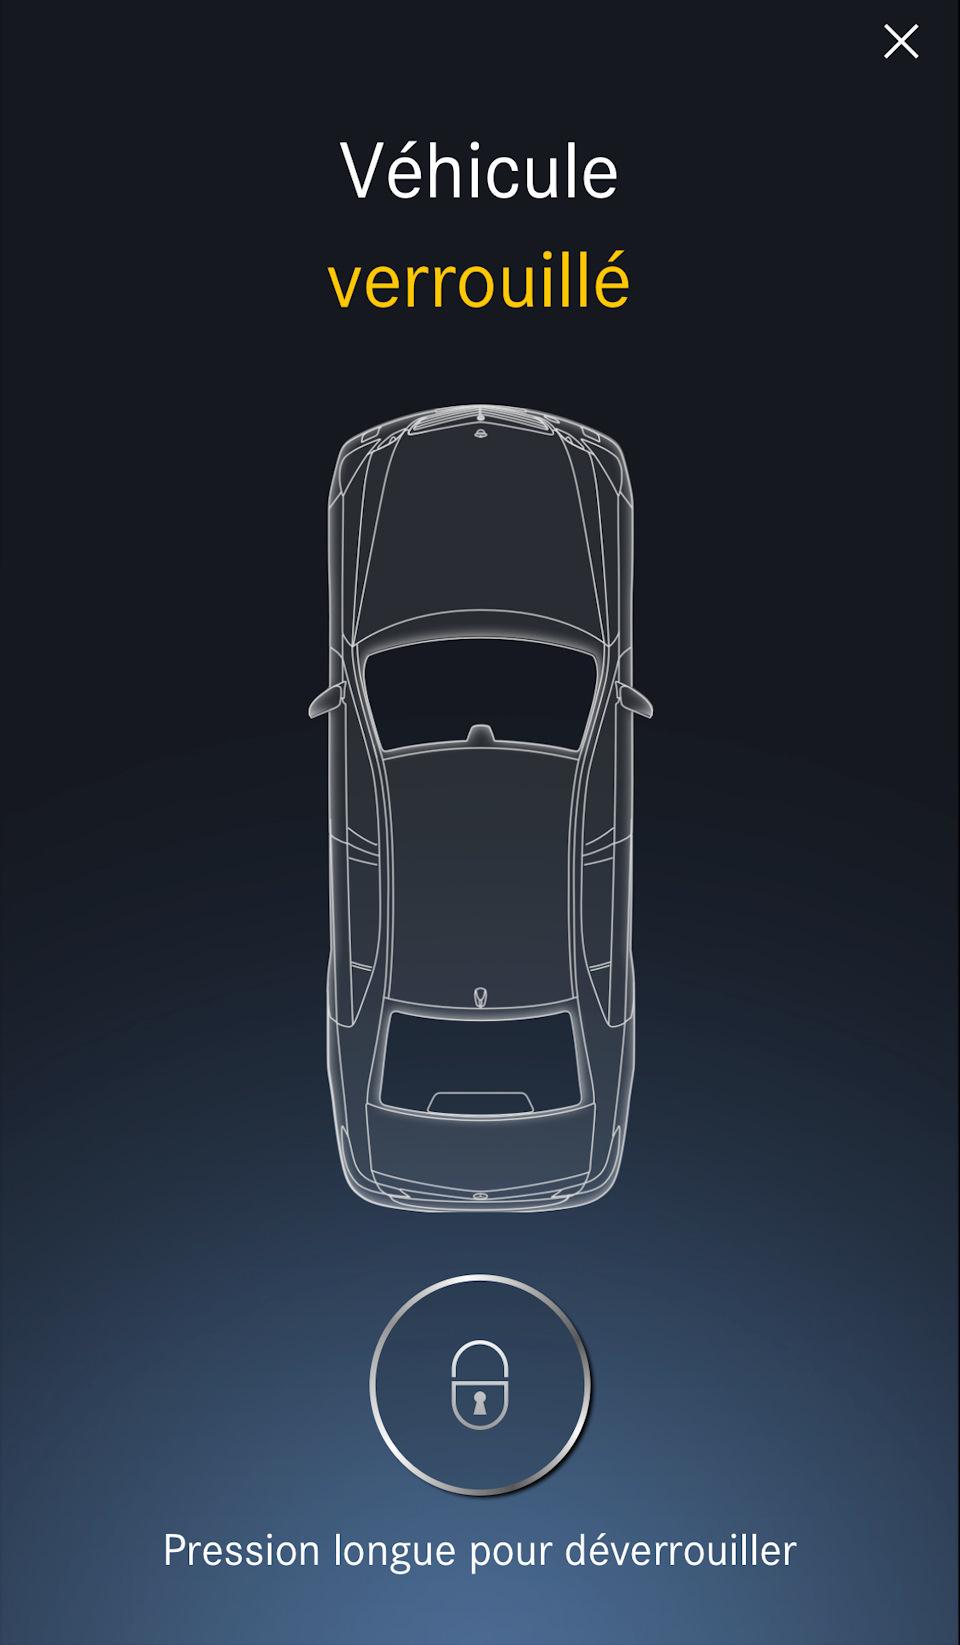 Mercedes-Benz E-class 2 Литра Элитного Молока › Бортжурнал › Активировал функцию дистанционной парковки и отпирание/закрывание с телефона. Mercedes Me, Parking app